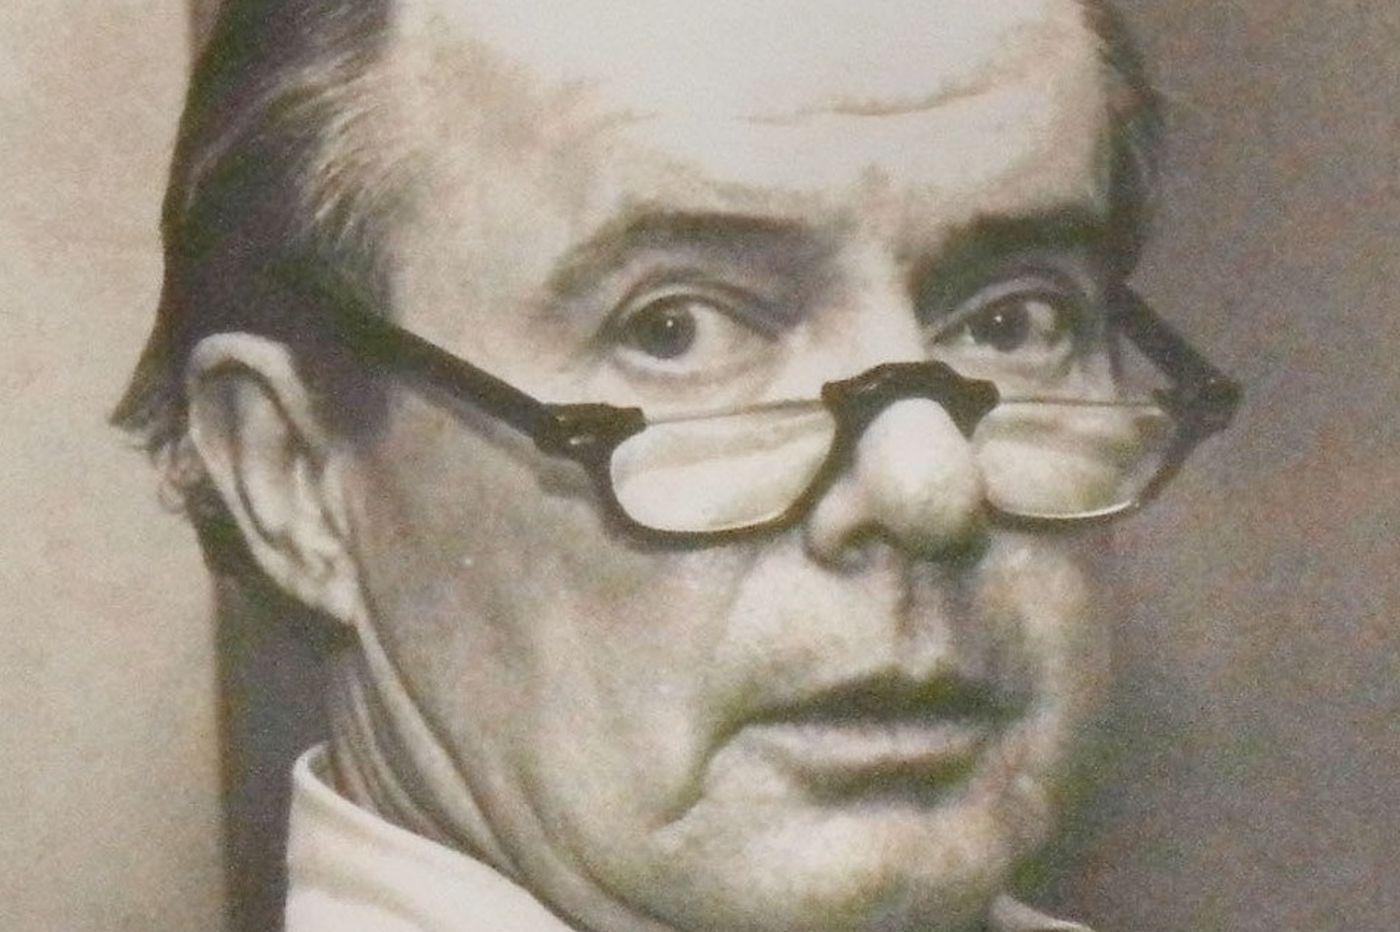 John Praksta, 90, editor who shaped the Philadelphia Daily News